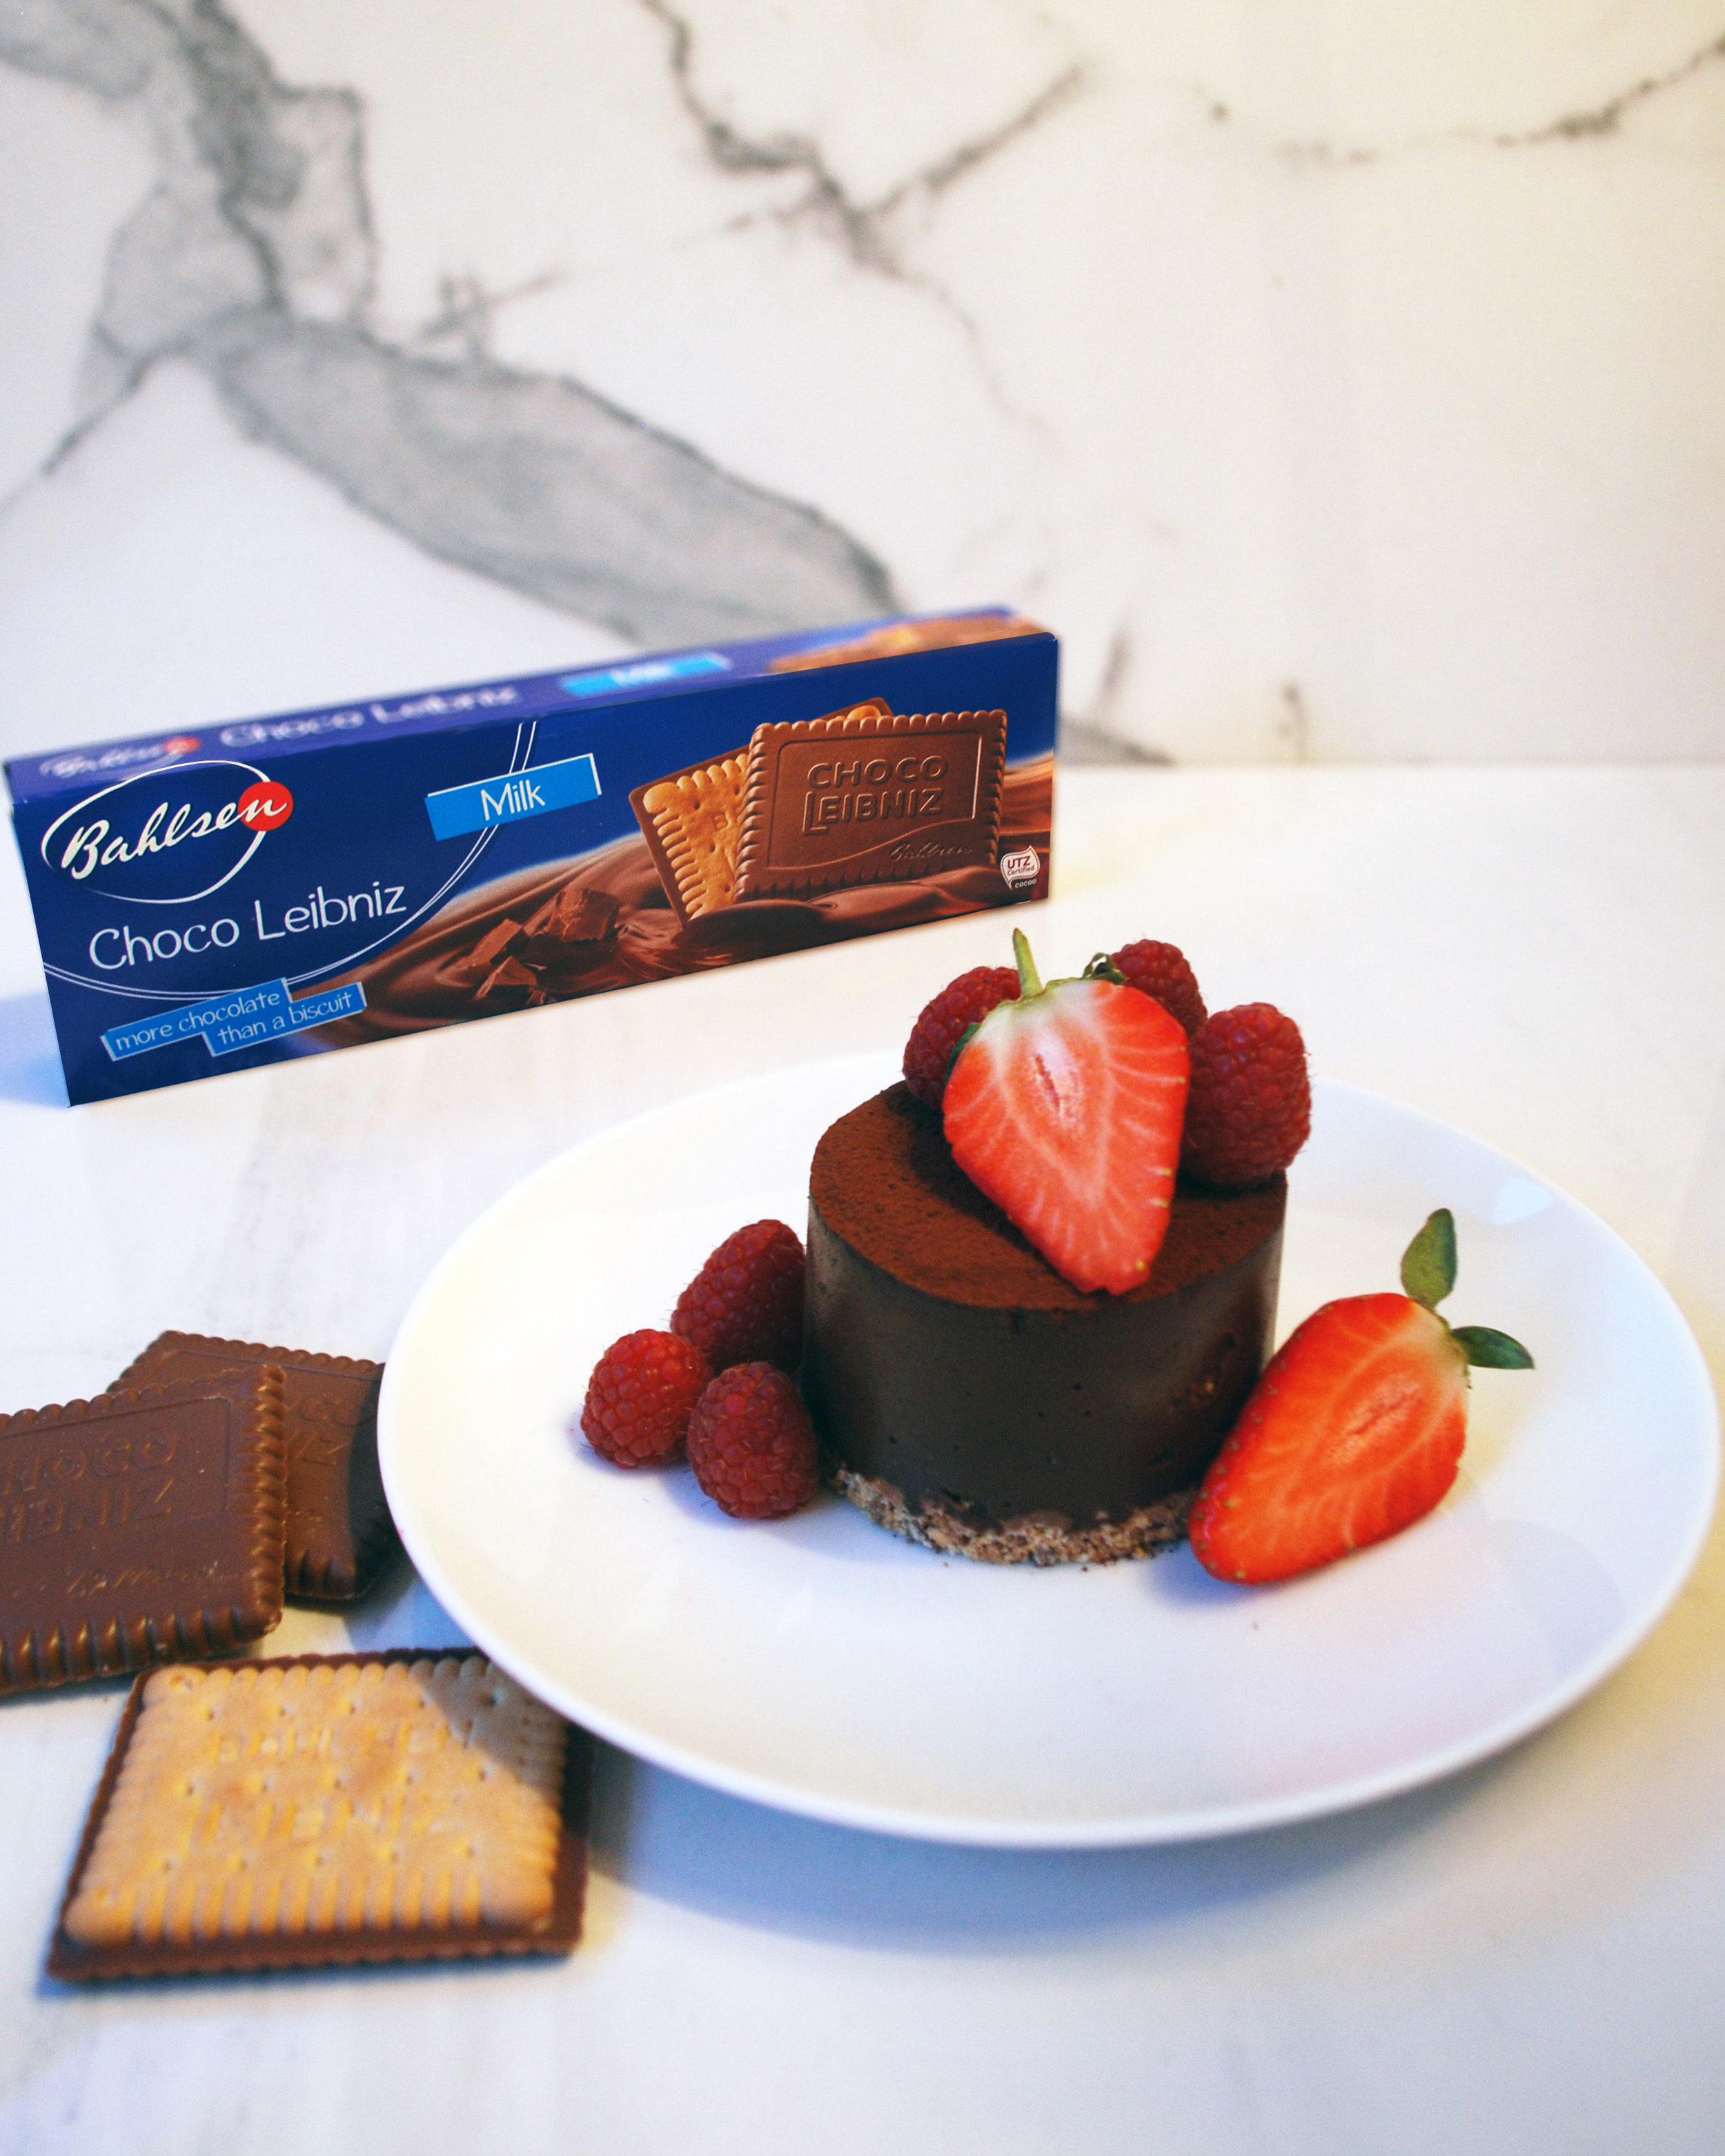 Choco Leibniz Tart